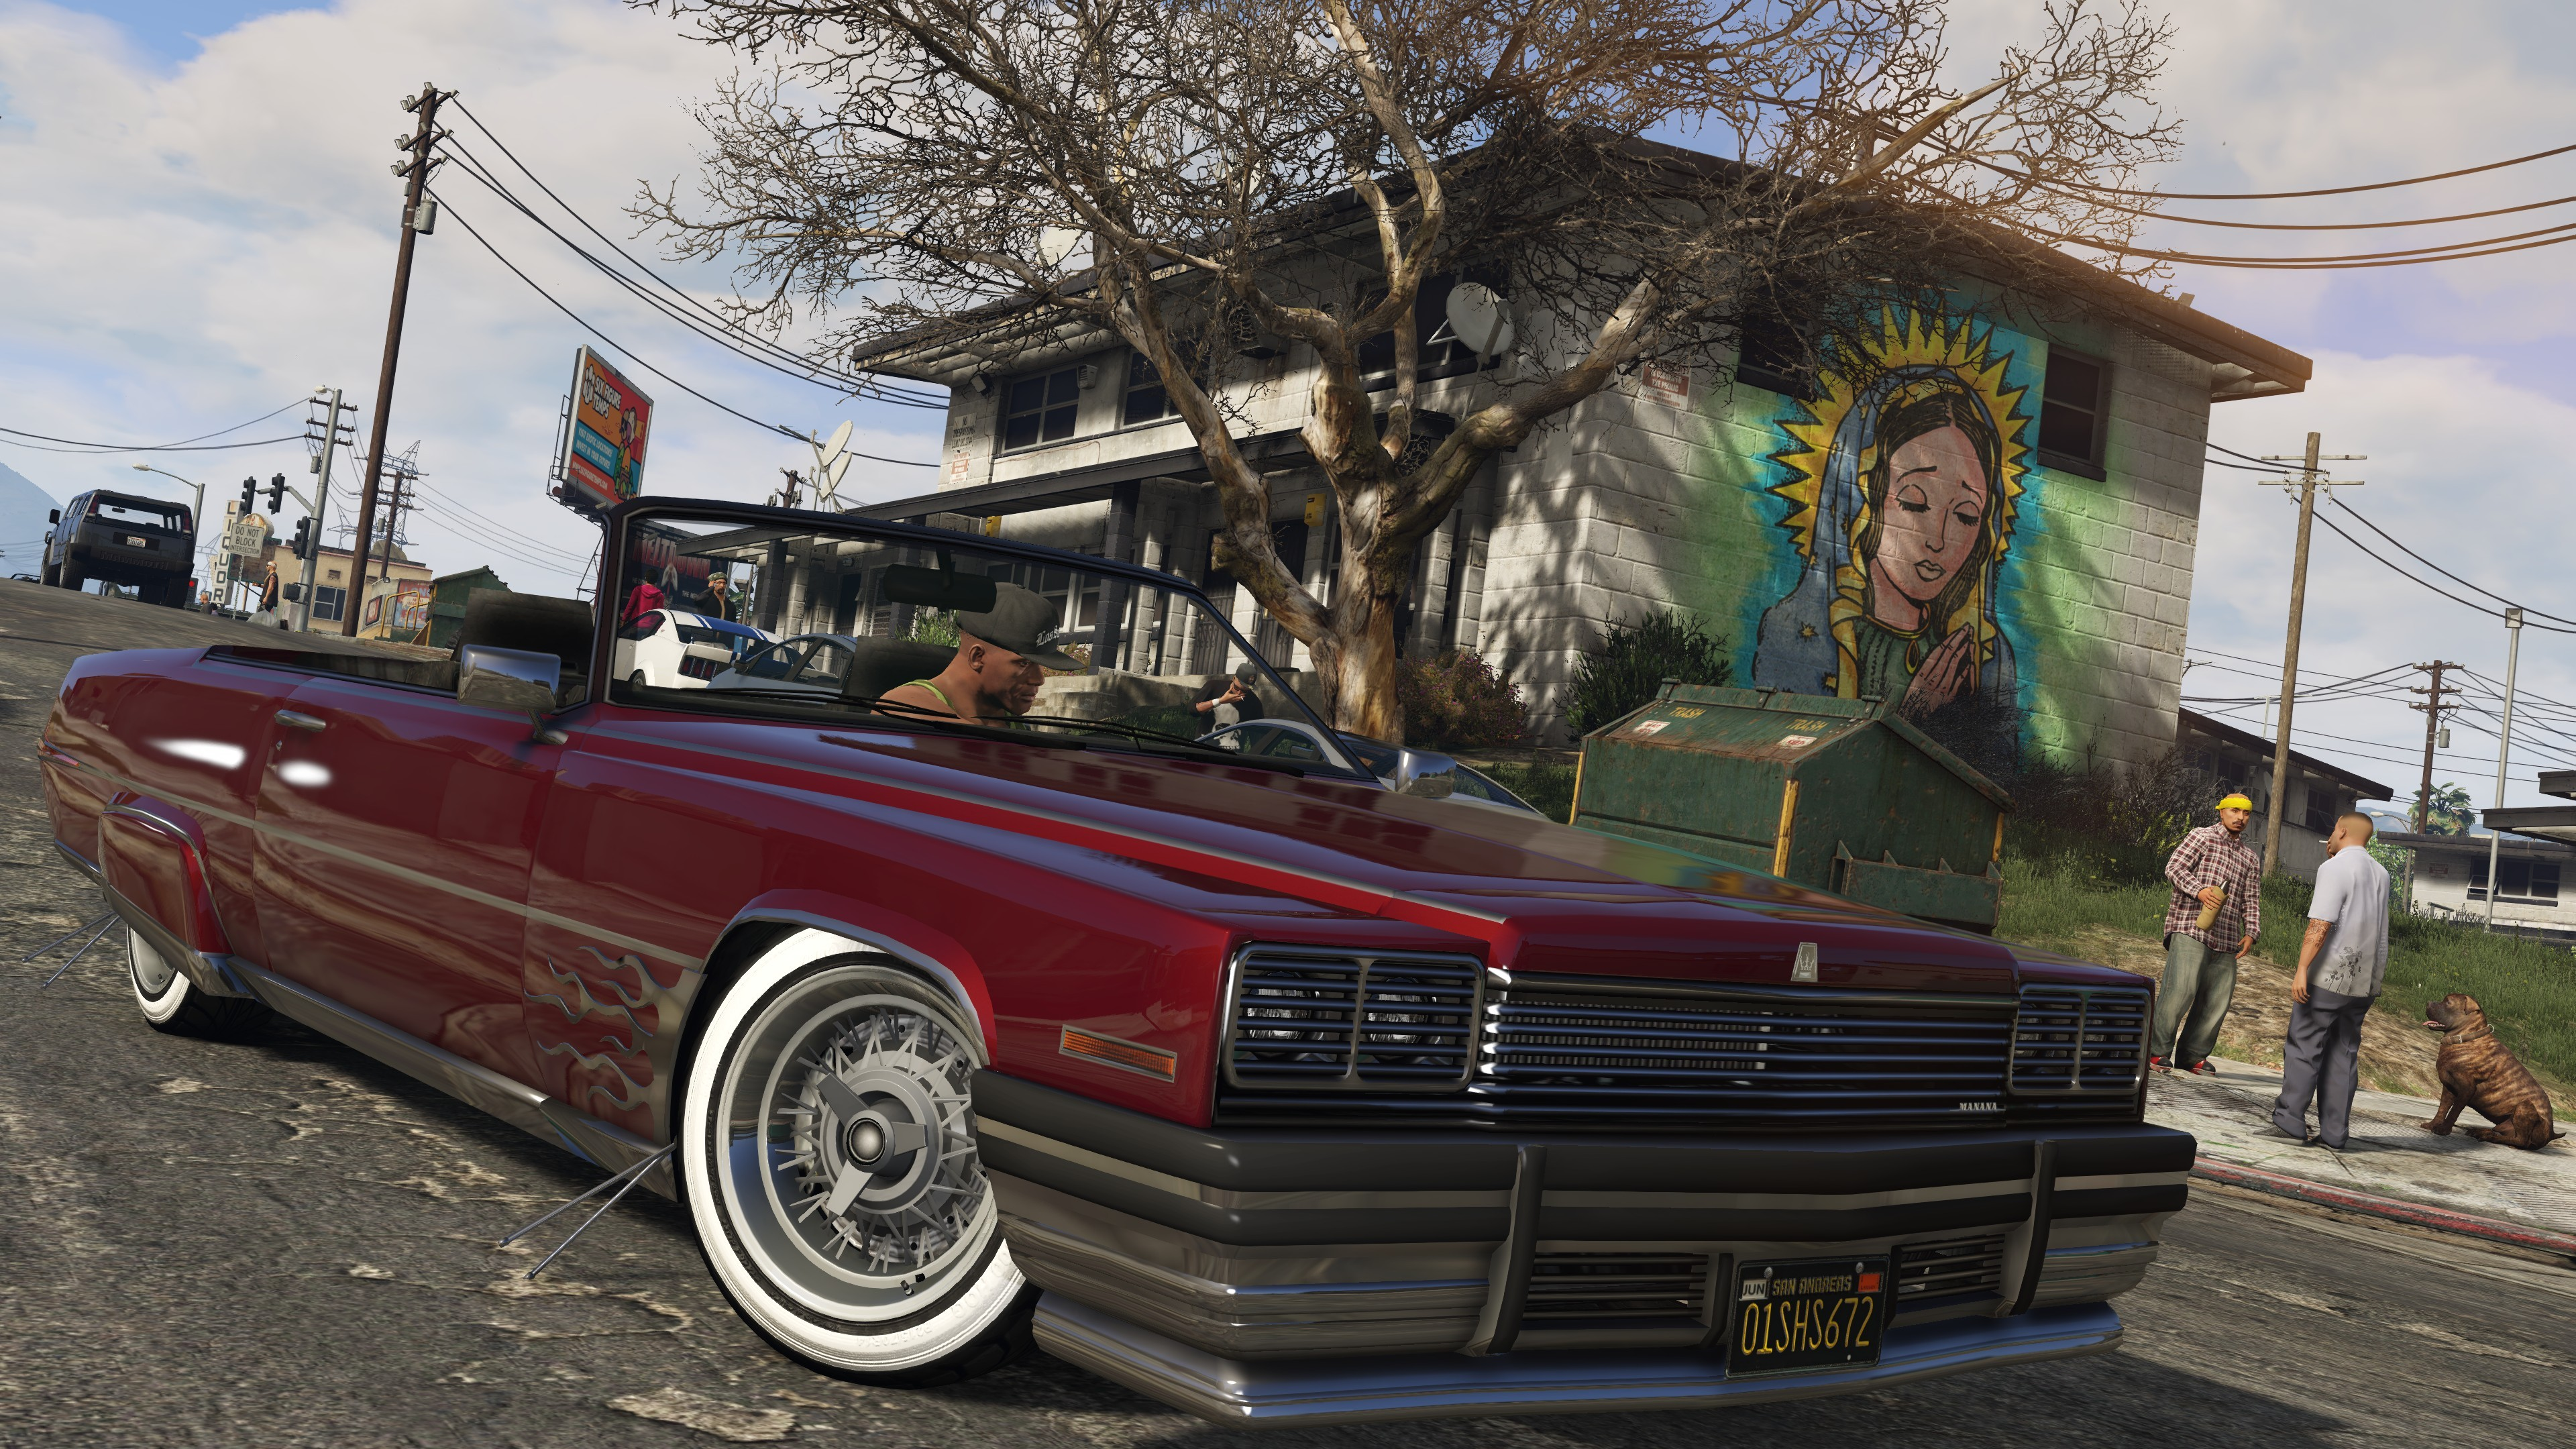 General 3840x2160 Grand Theft Auto V Grand Theft Auto V PC PC gaming Rockstar Games